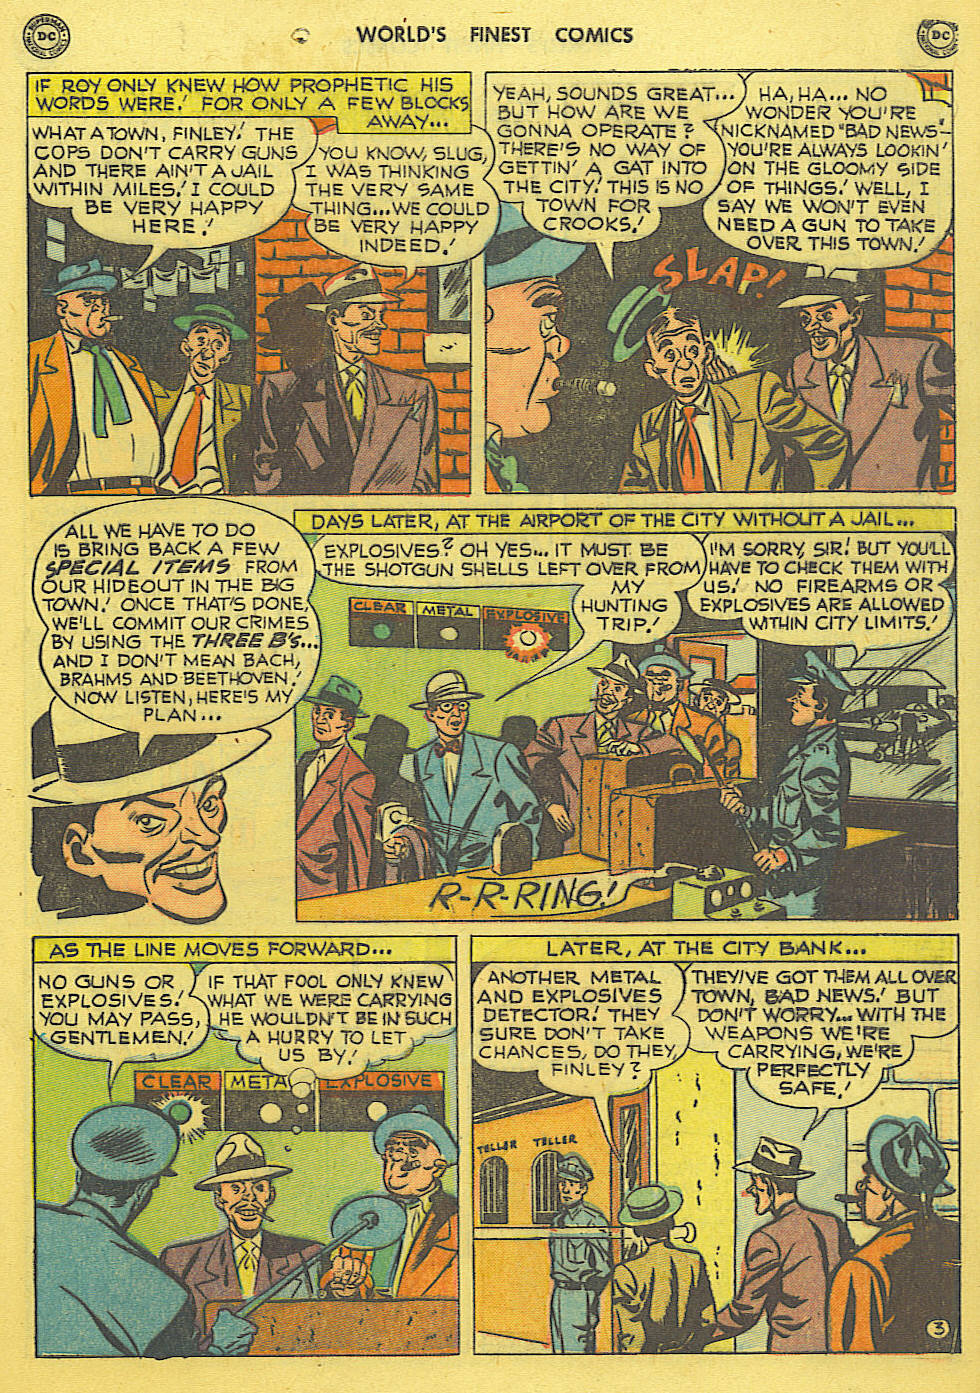 Read online World's Finest Comics comic -  Issue #49 - 20